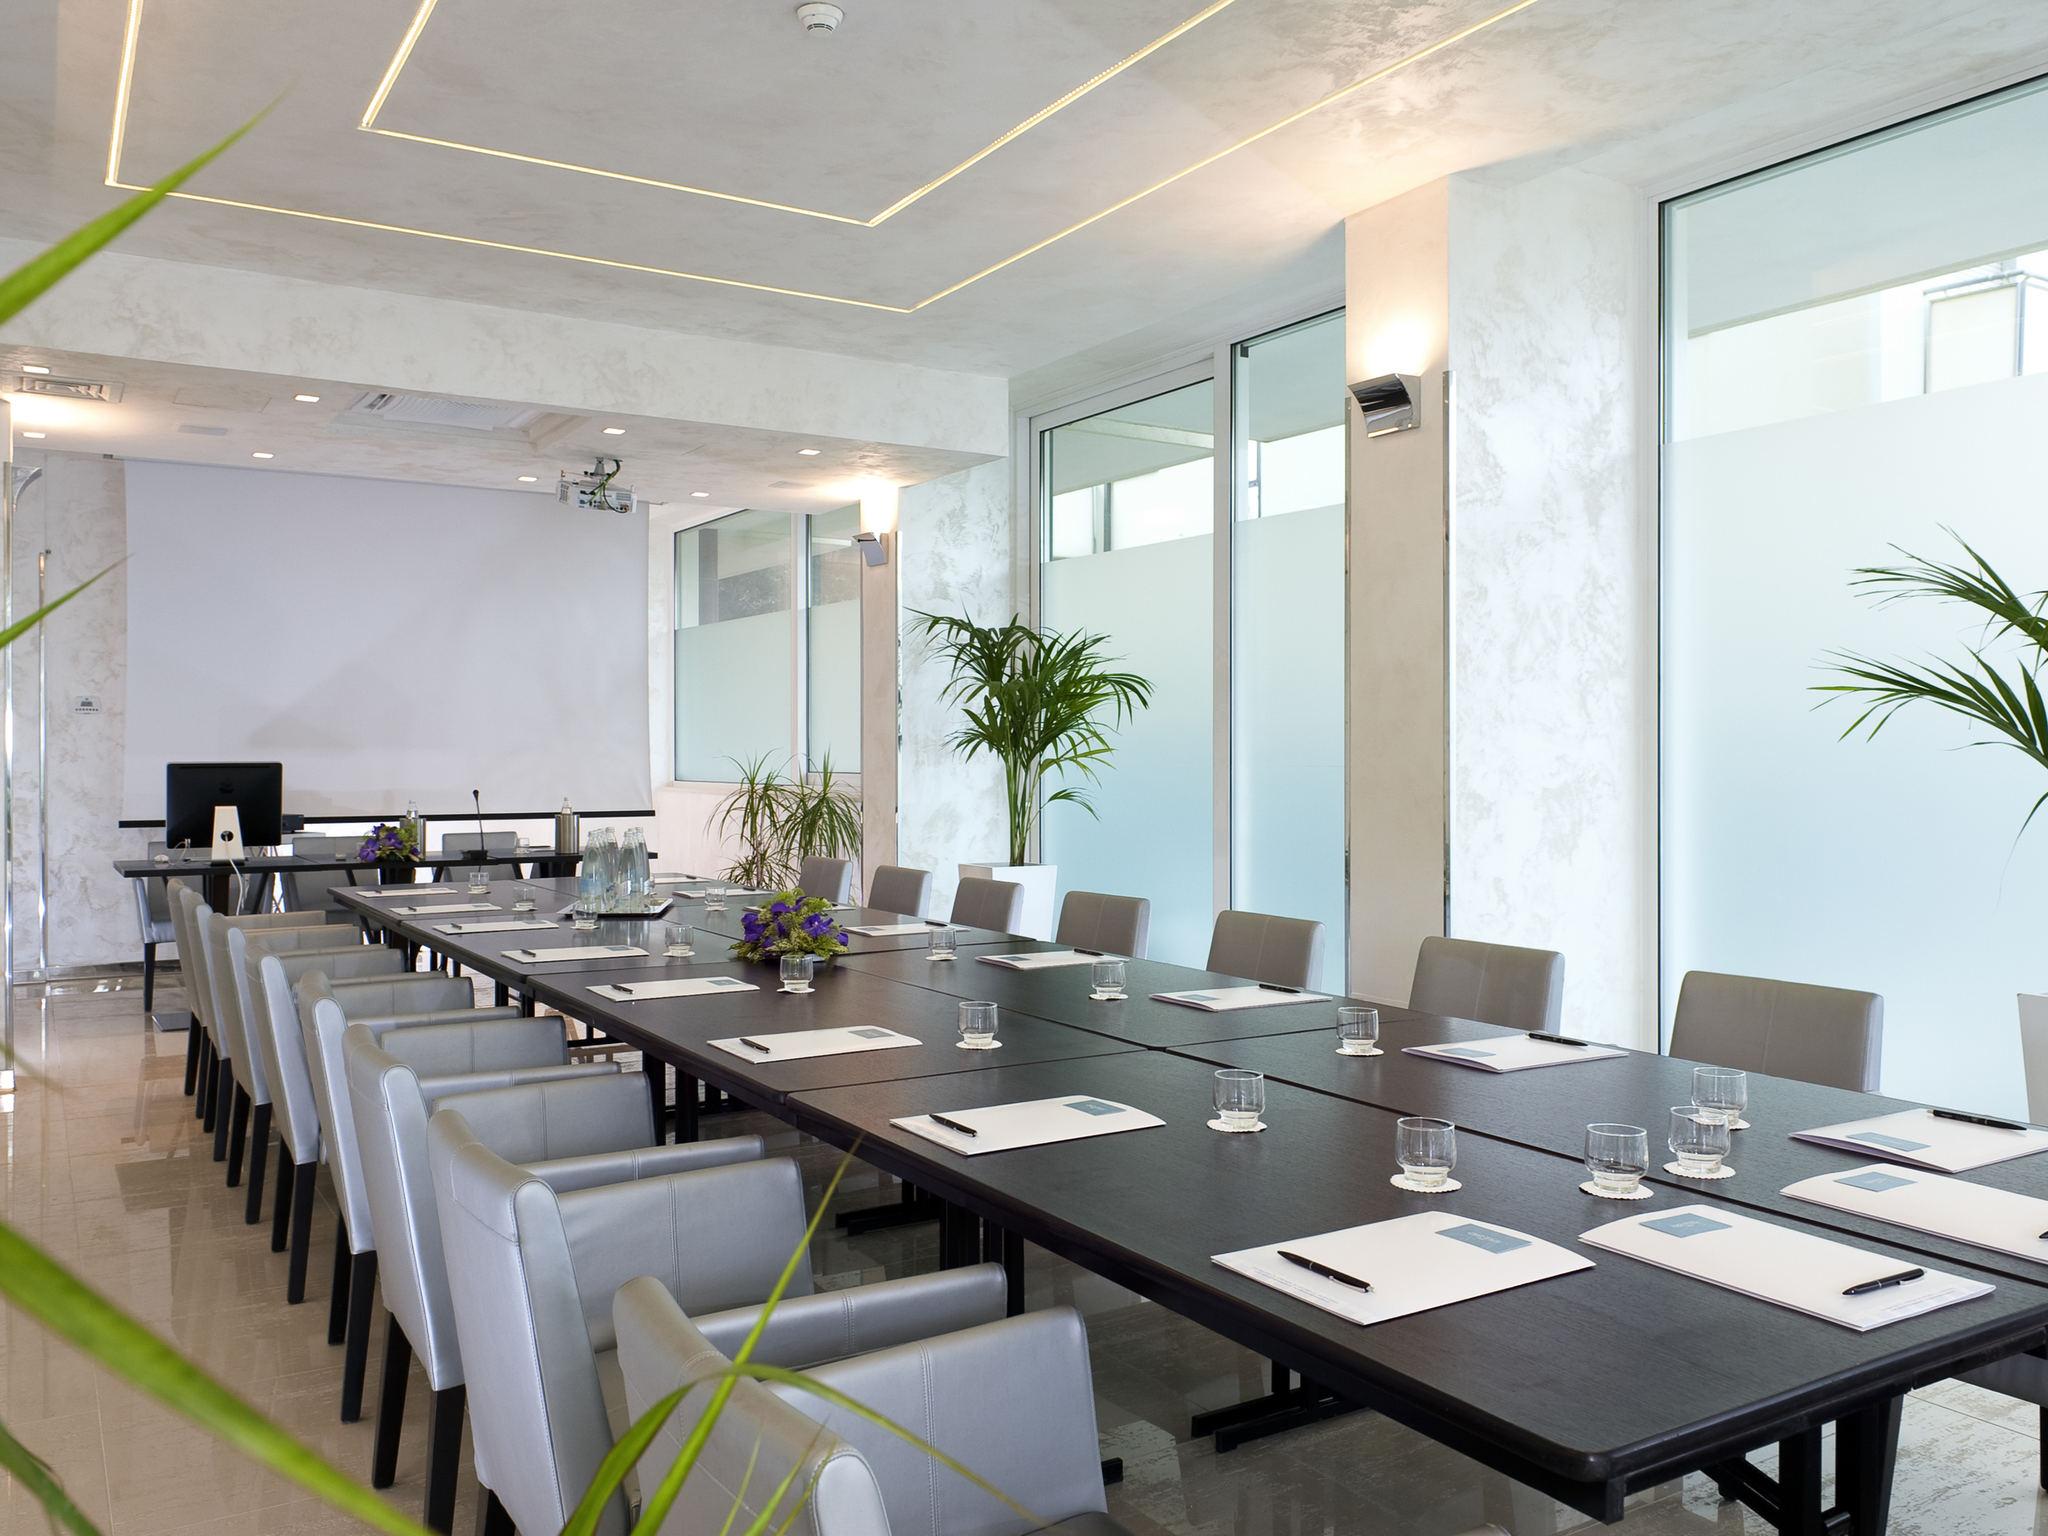 Mercure rimini artis hotel for Paini arredamenti